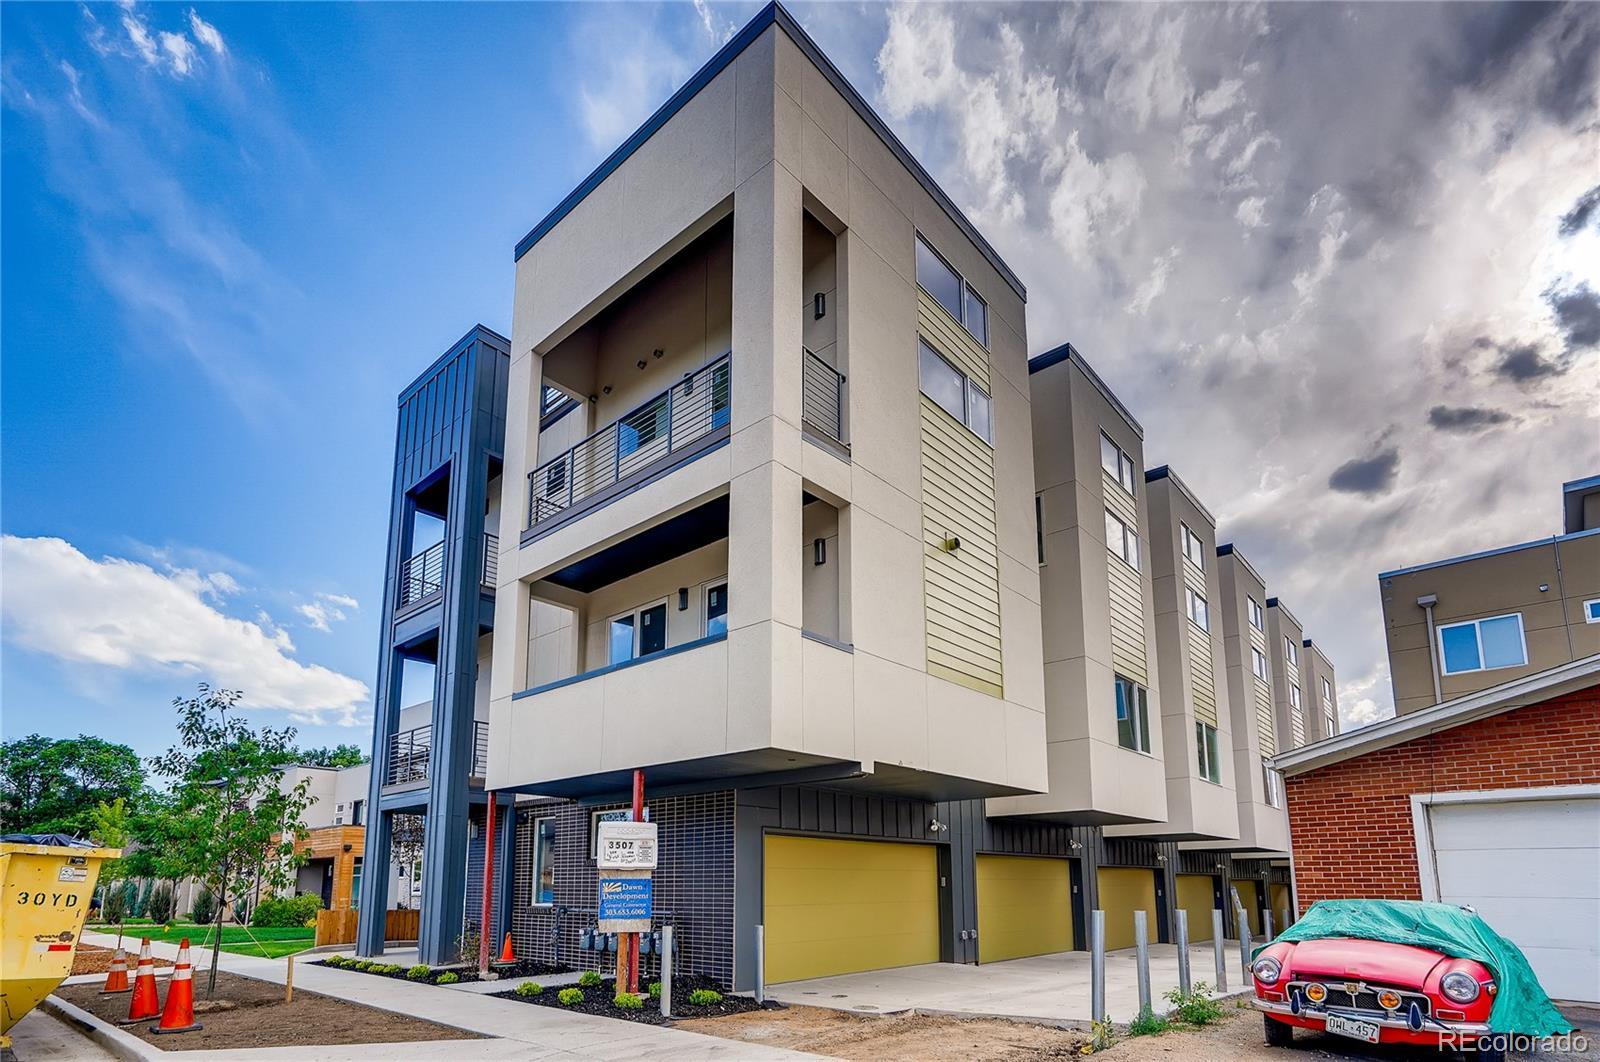 3507 S Ogden Street #F Property Photo - Englewood, CO real estate listing